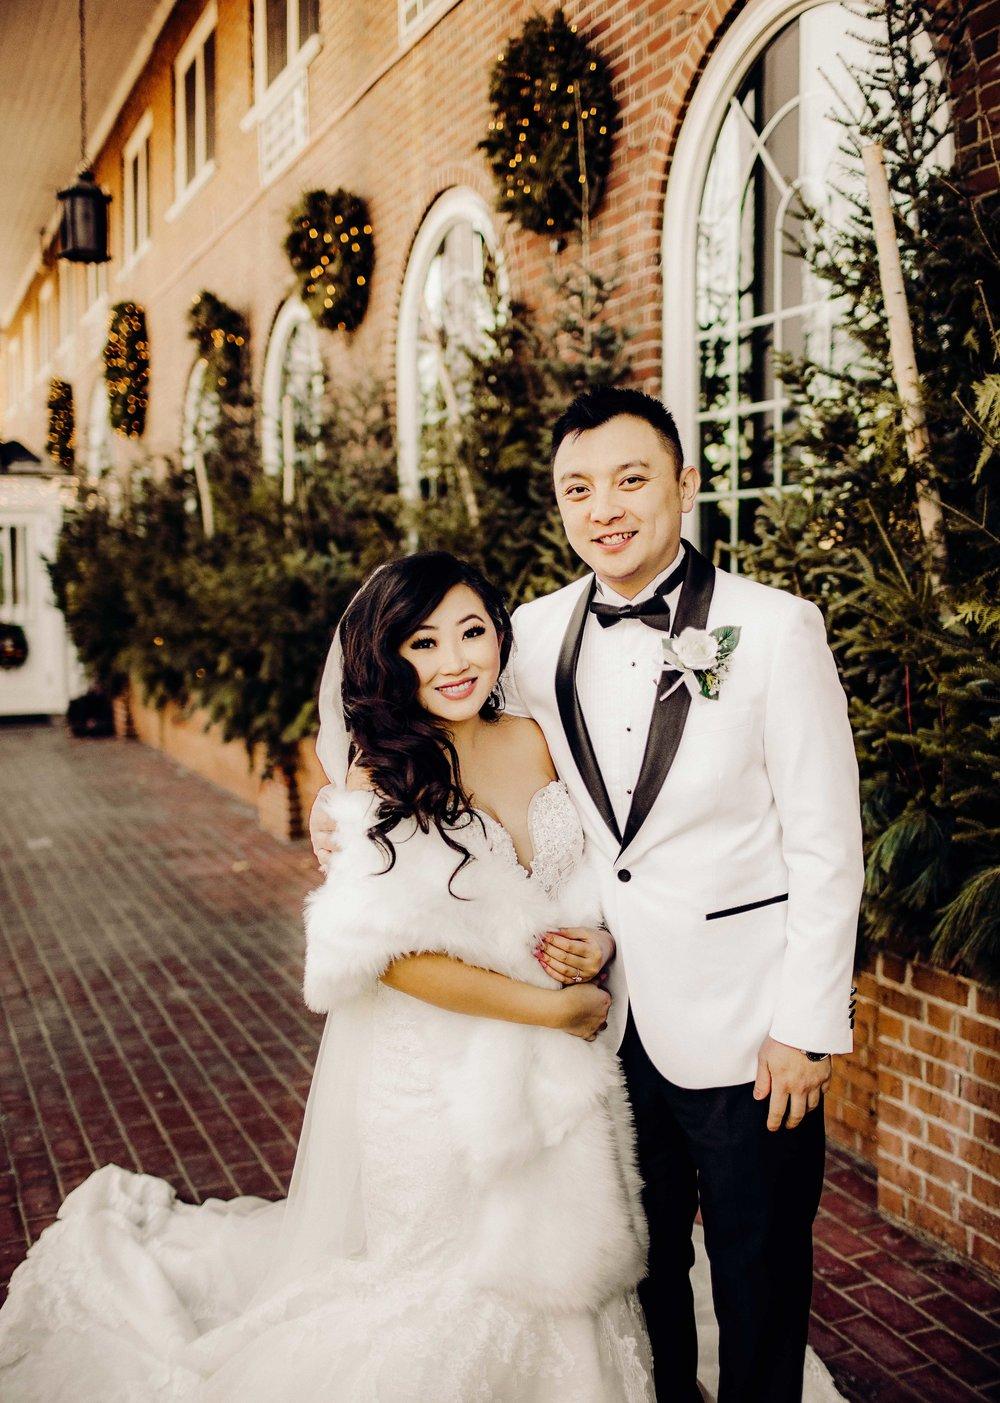 Honey + Yao, Part II, The Bride and Groom-50.jpg